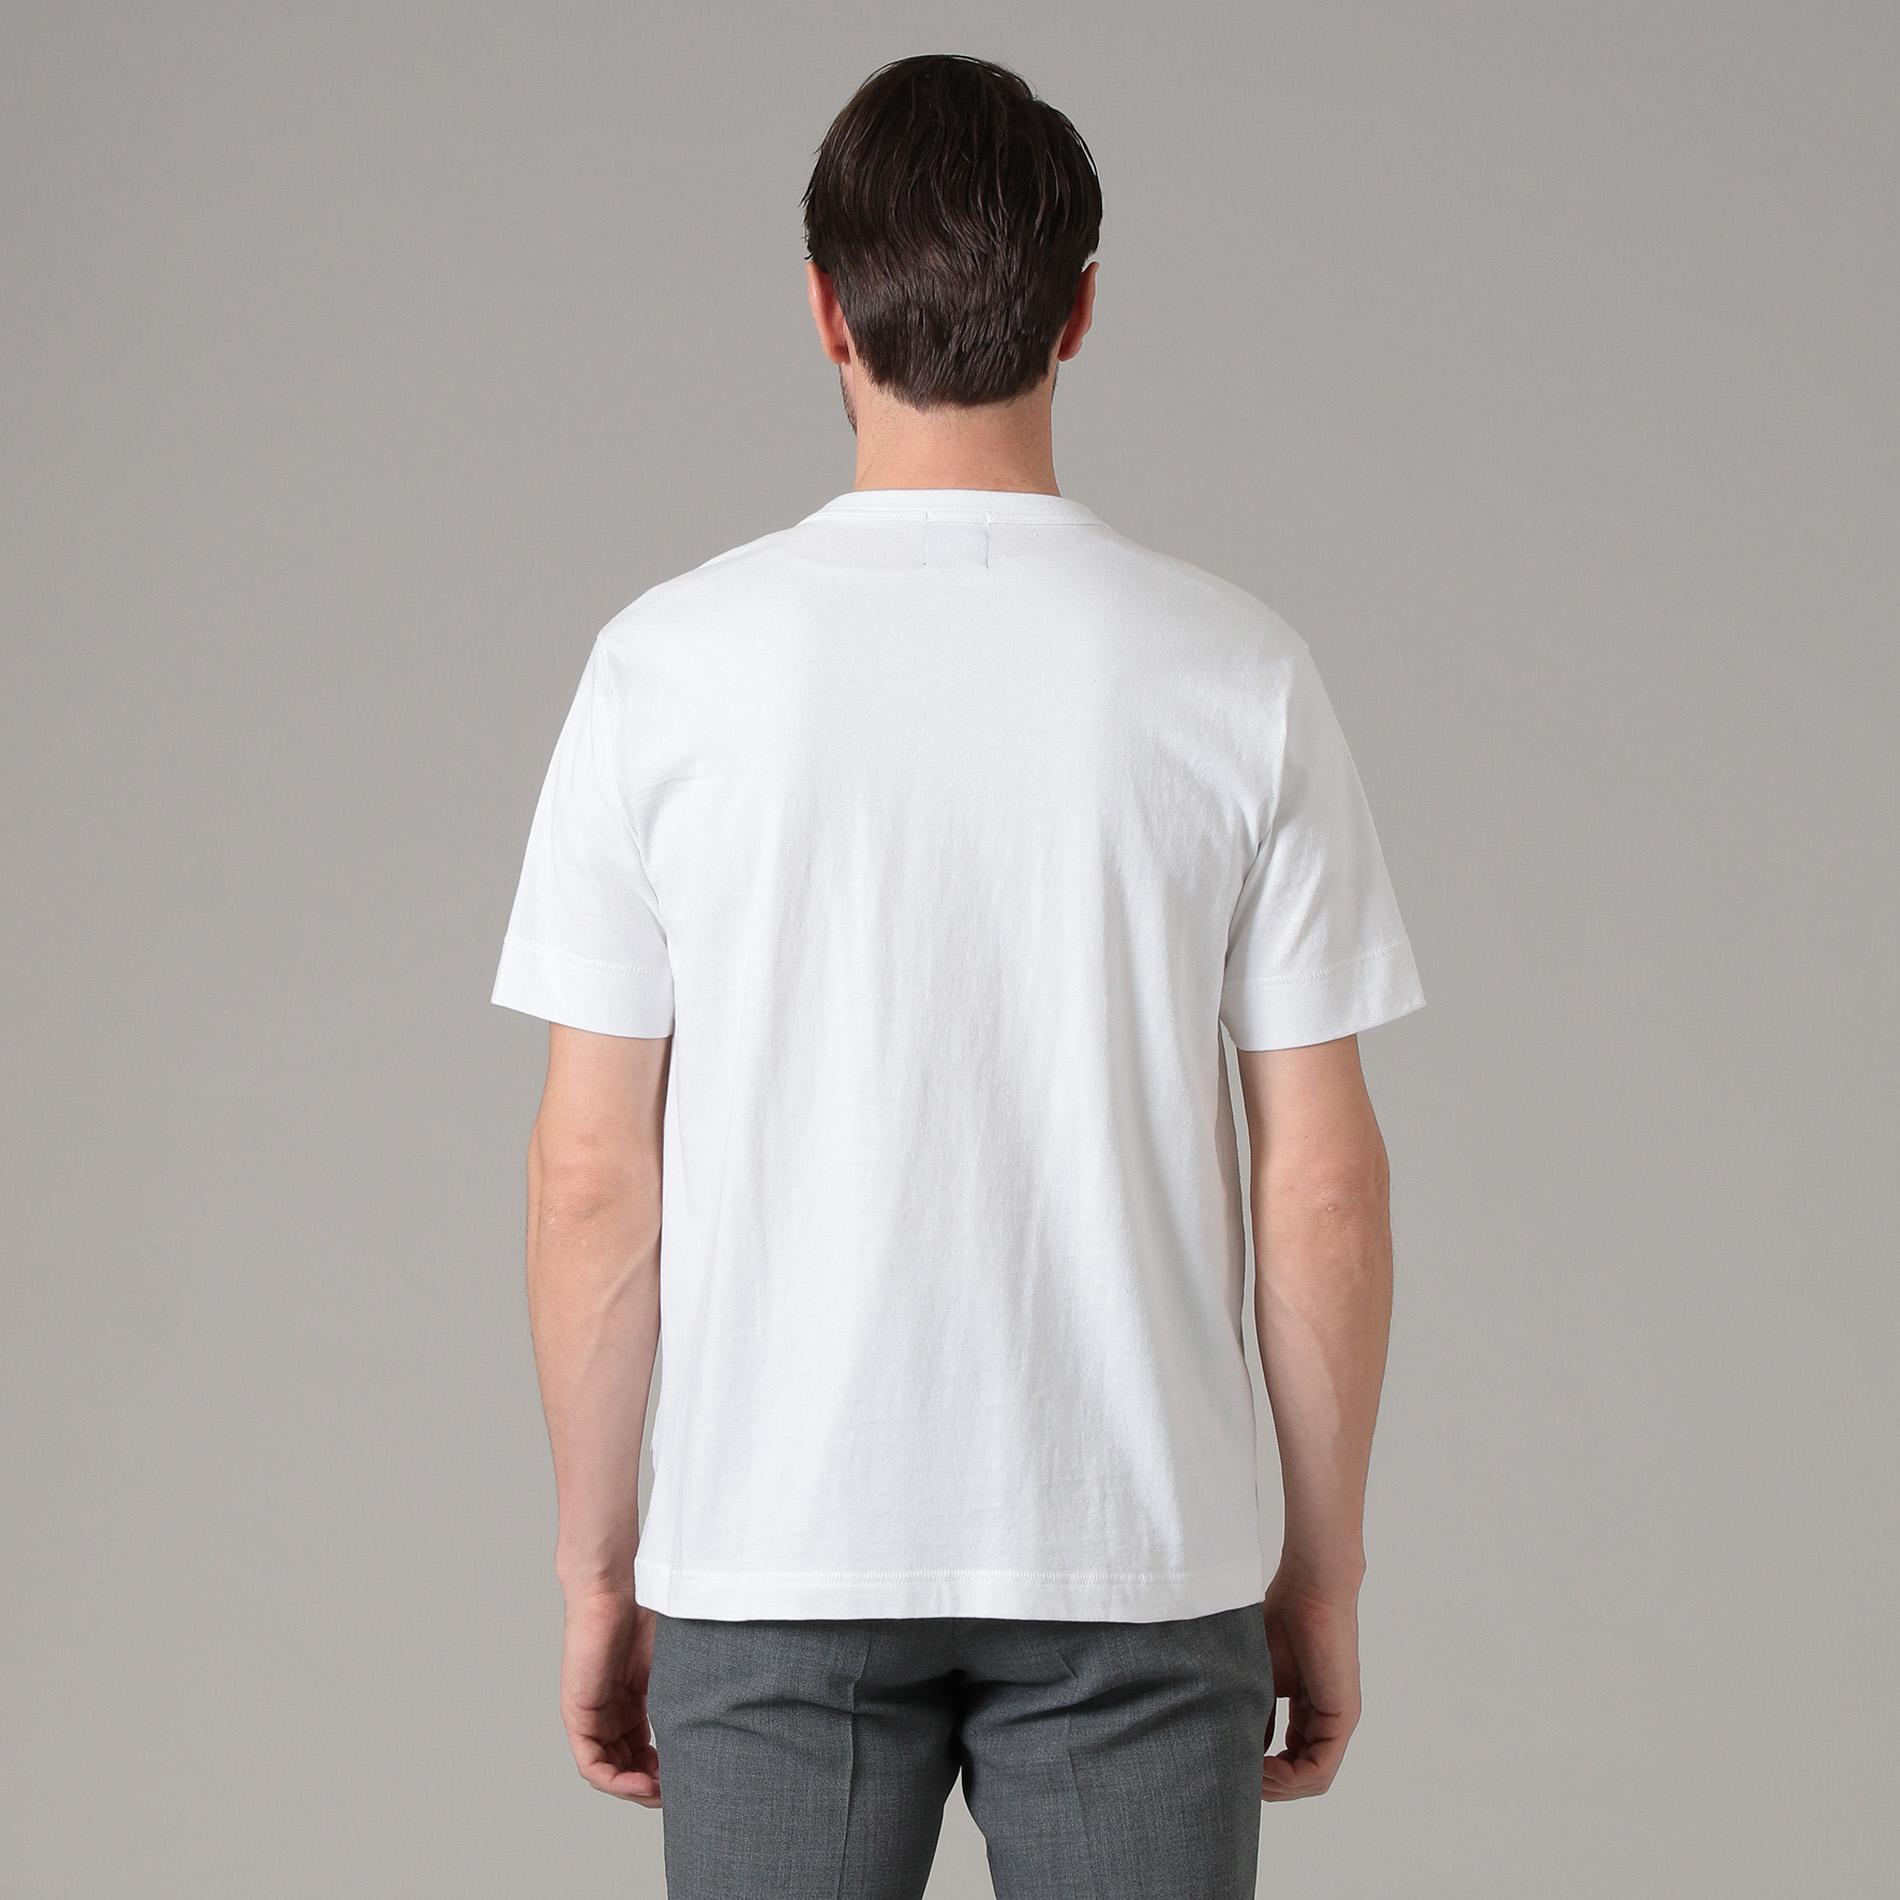 【Healthknit】コラボポケットTシャツ